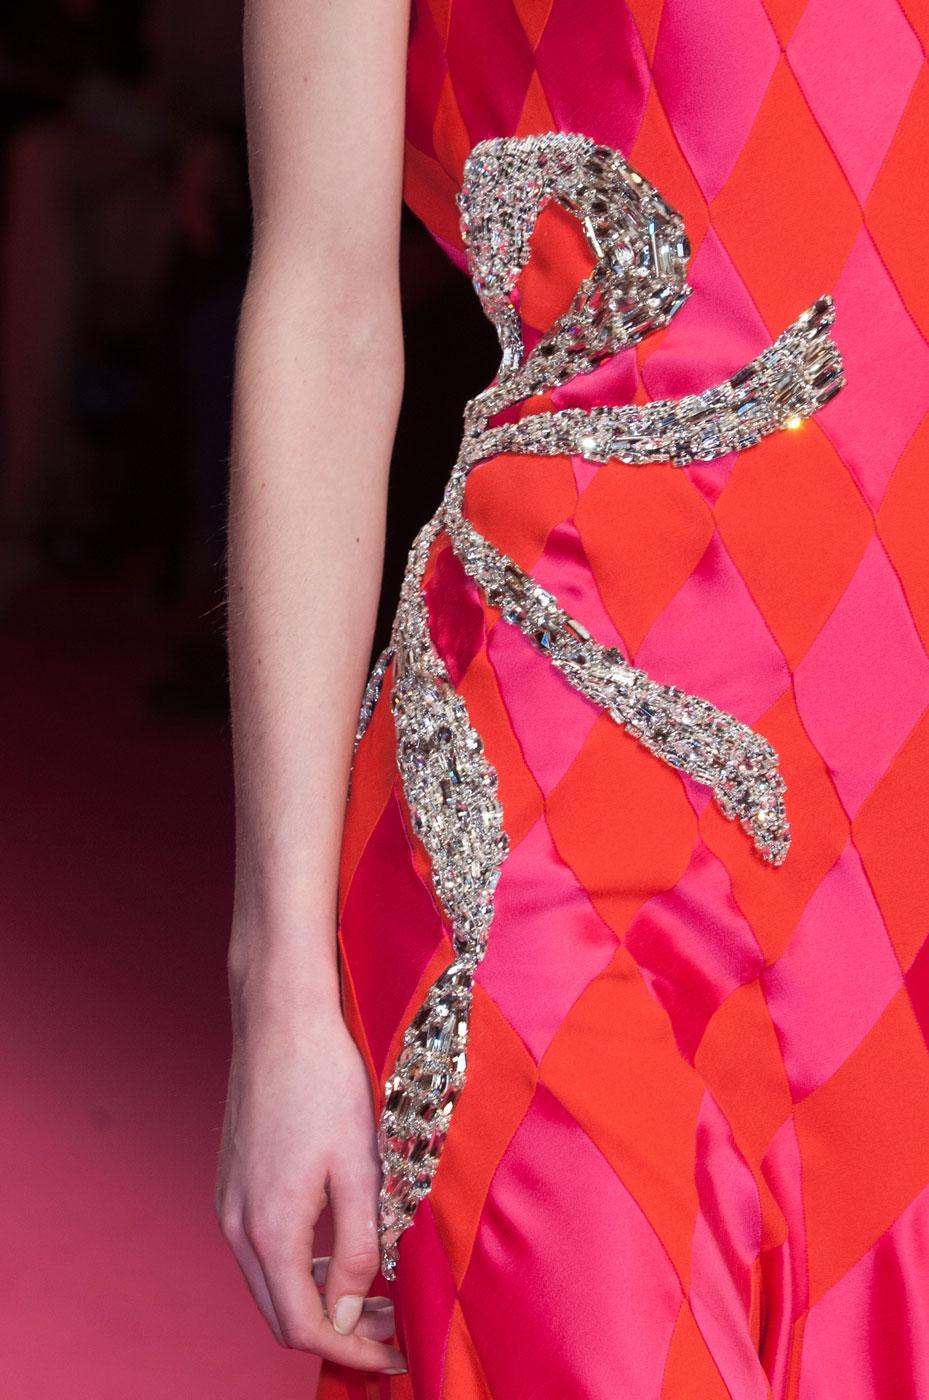 Schiaparelli-fashion-runway-show-close-ups-haute-couture-paris-spring-summer-2015-the-impression-34